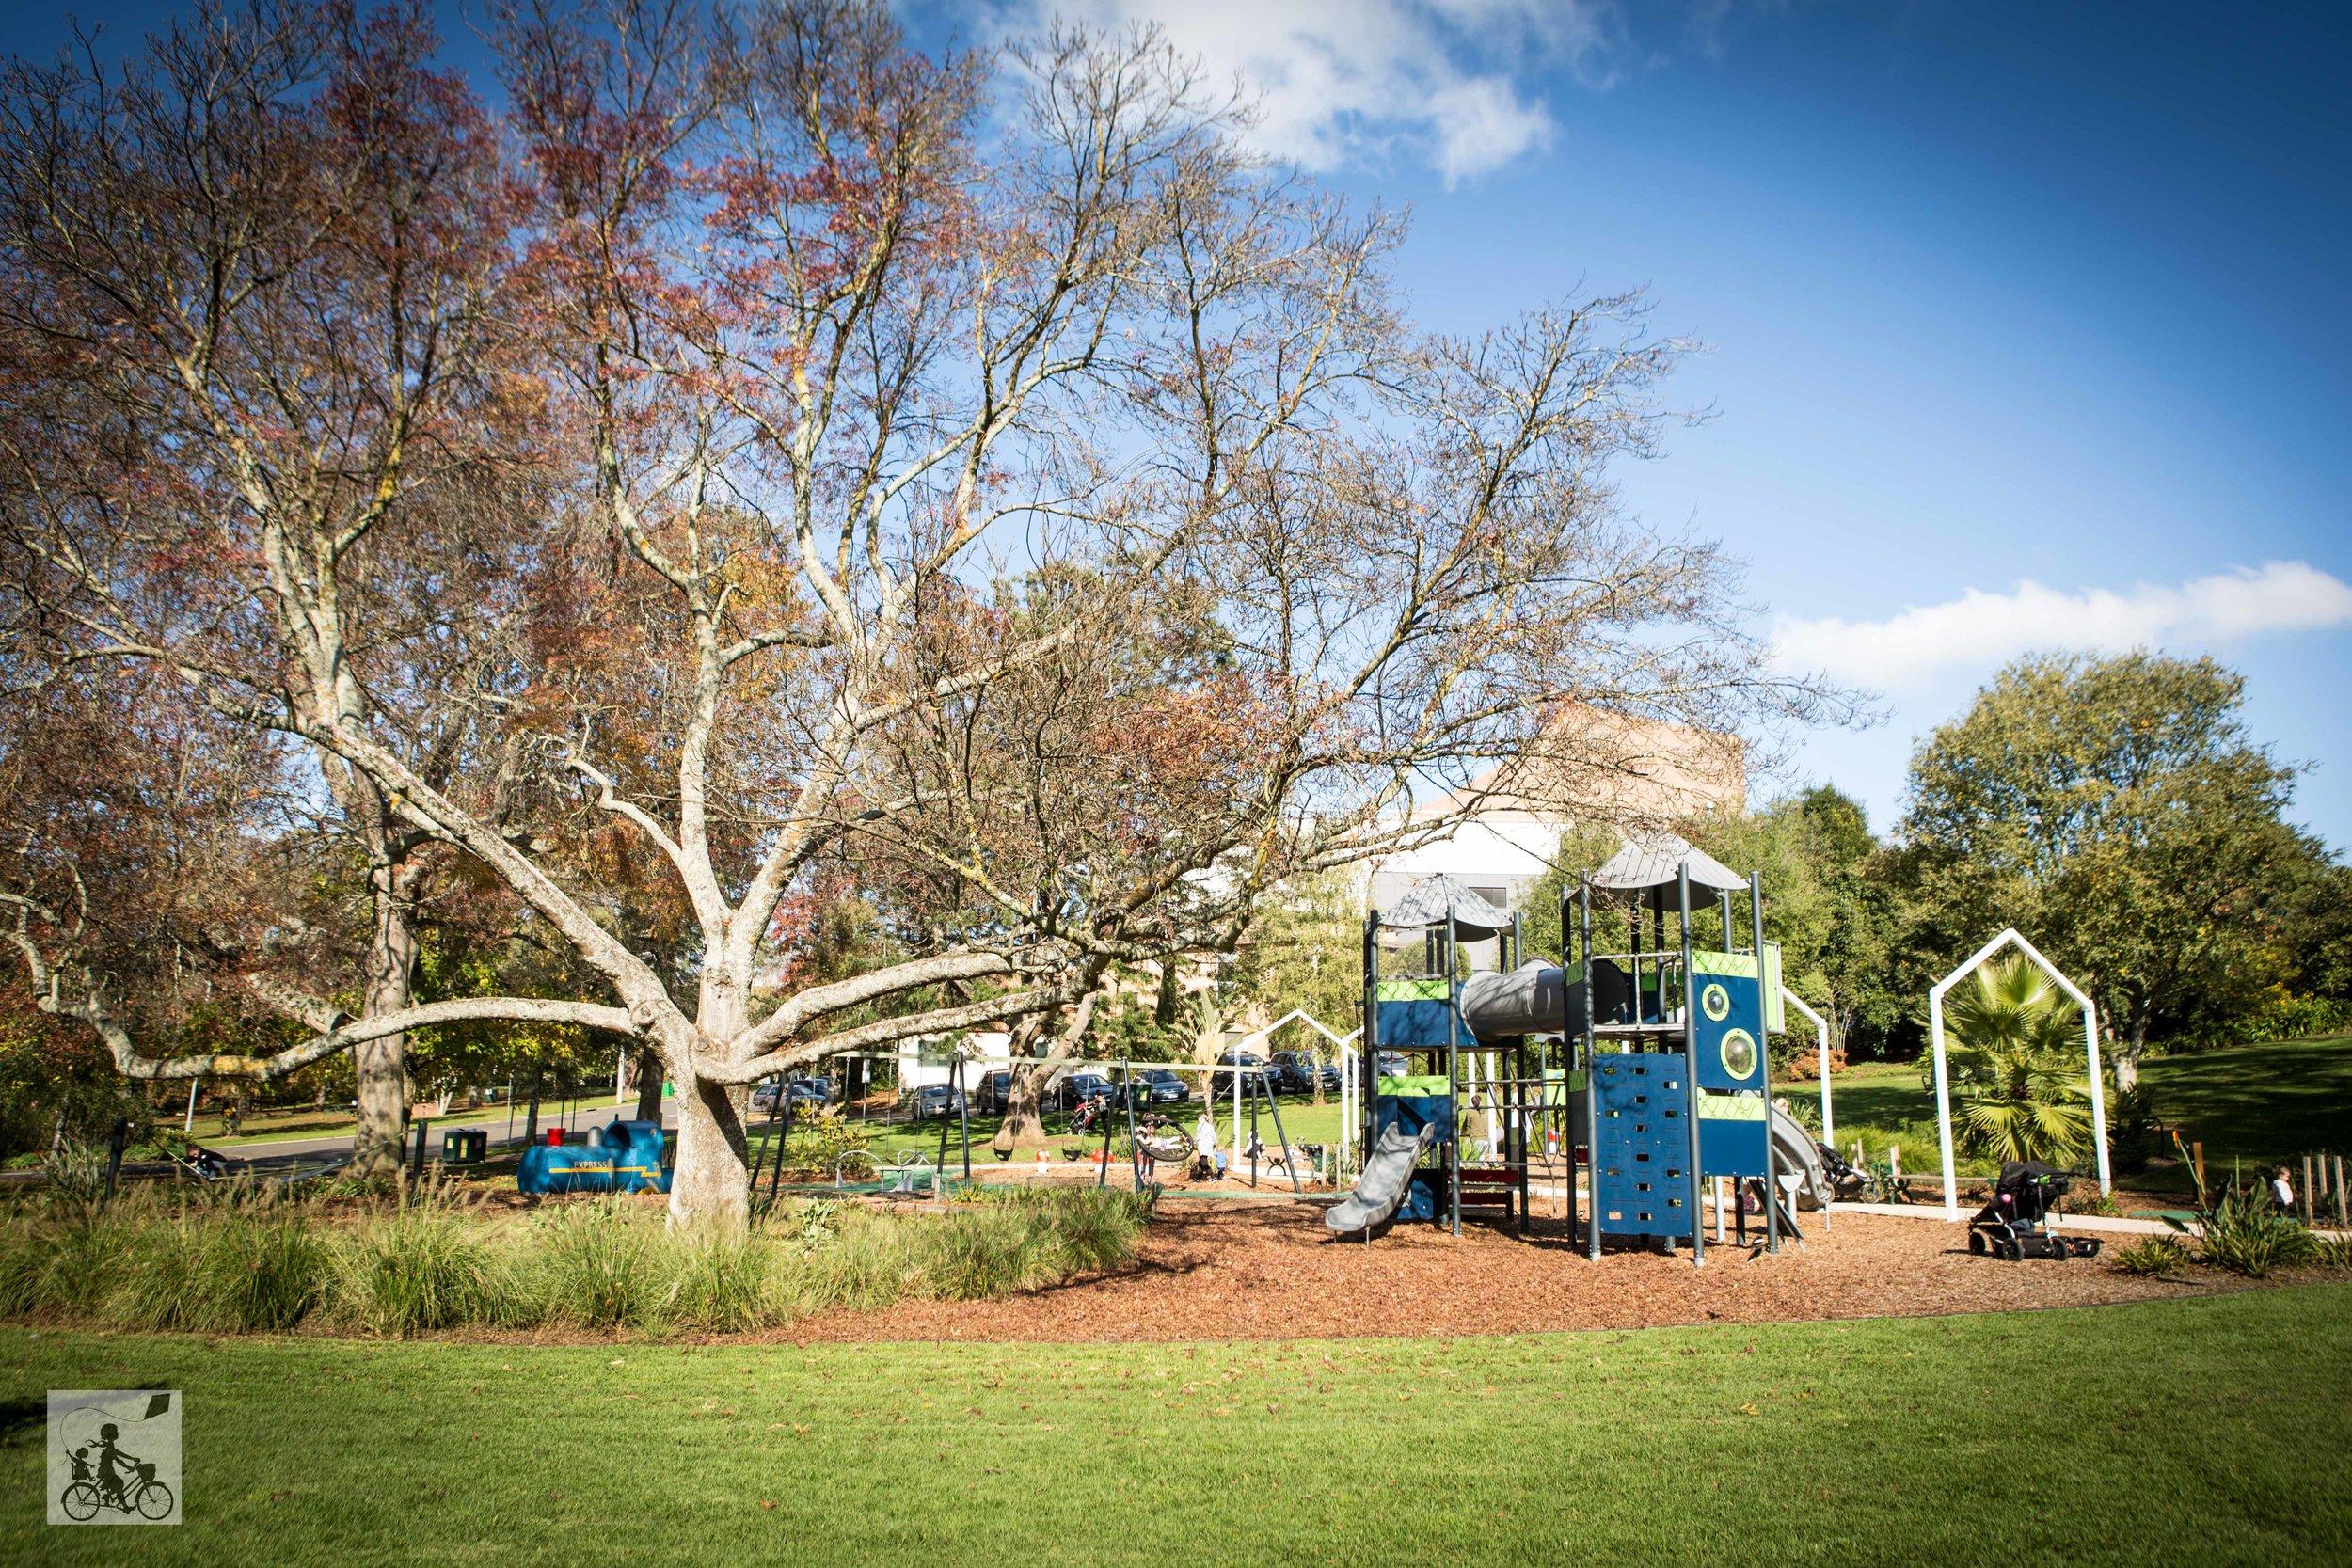 Civic Park Warragul - Mamma Knows East (26 of 29).jpg